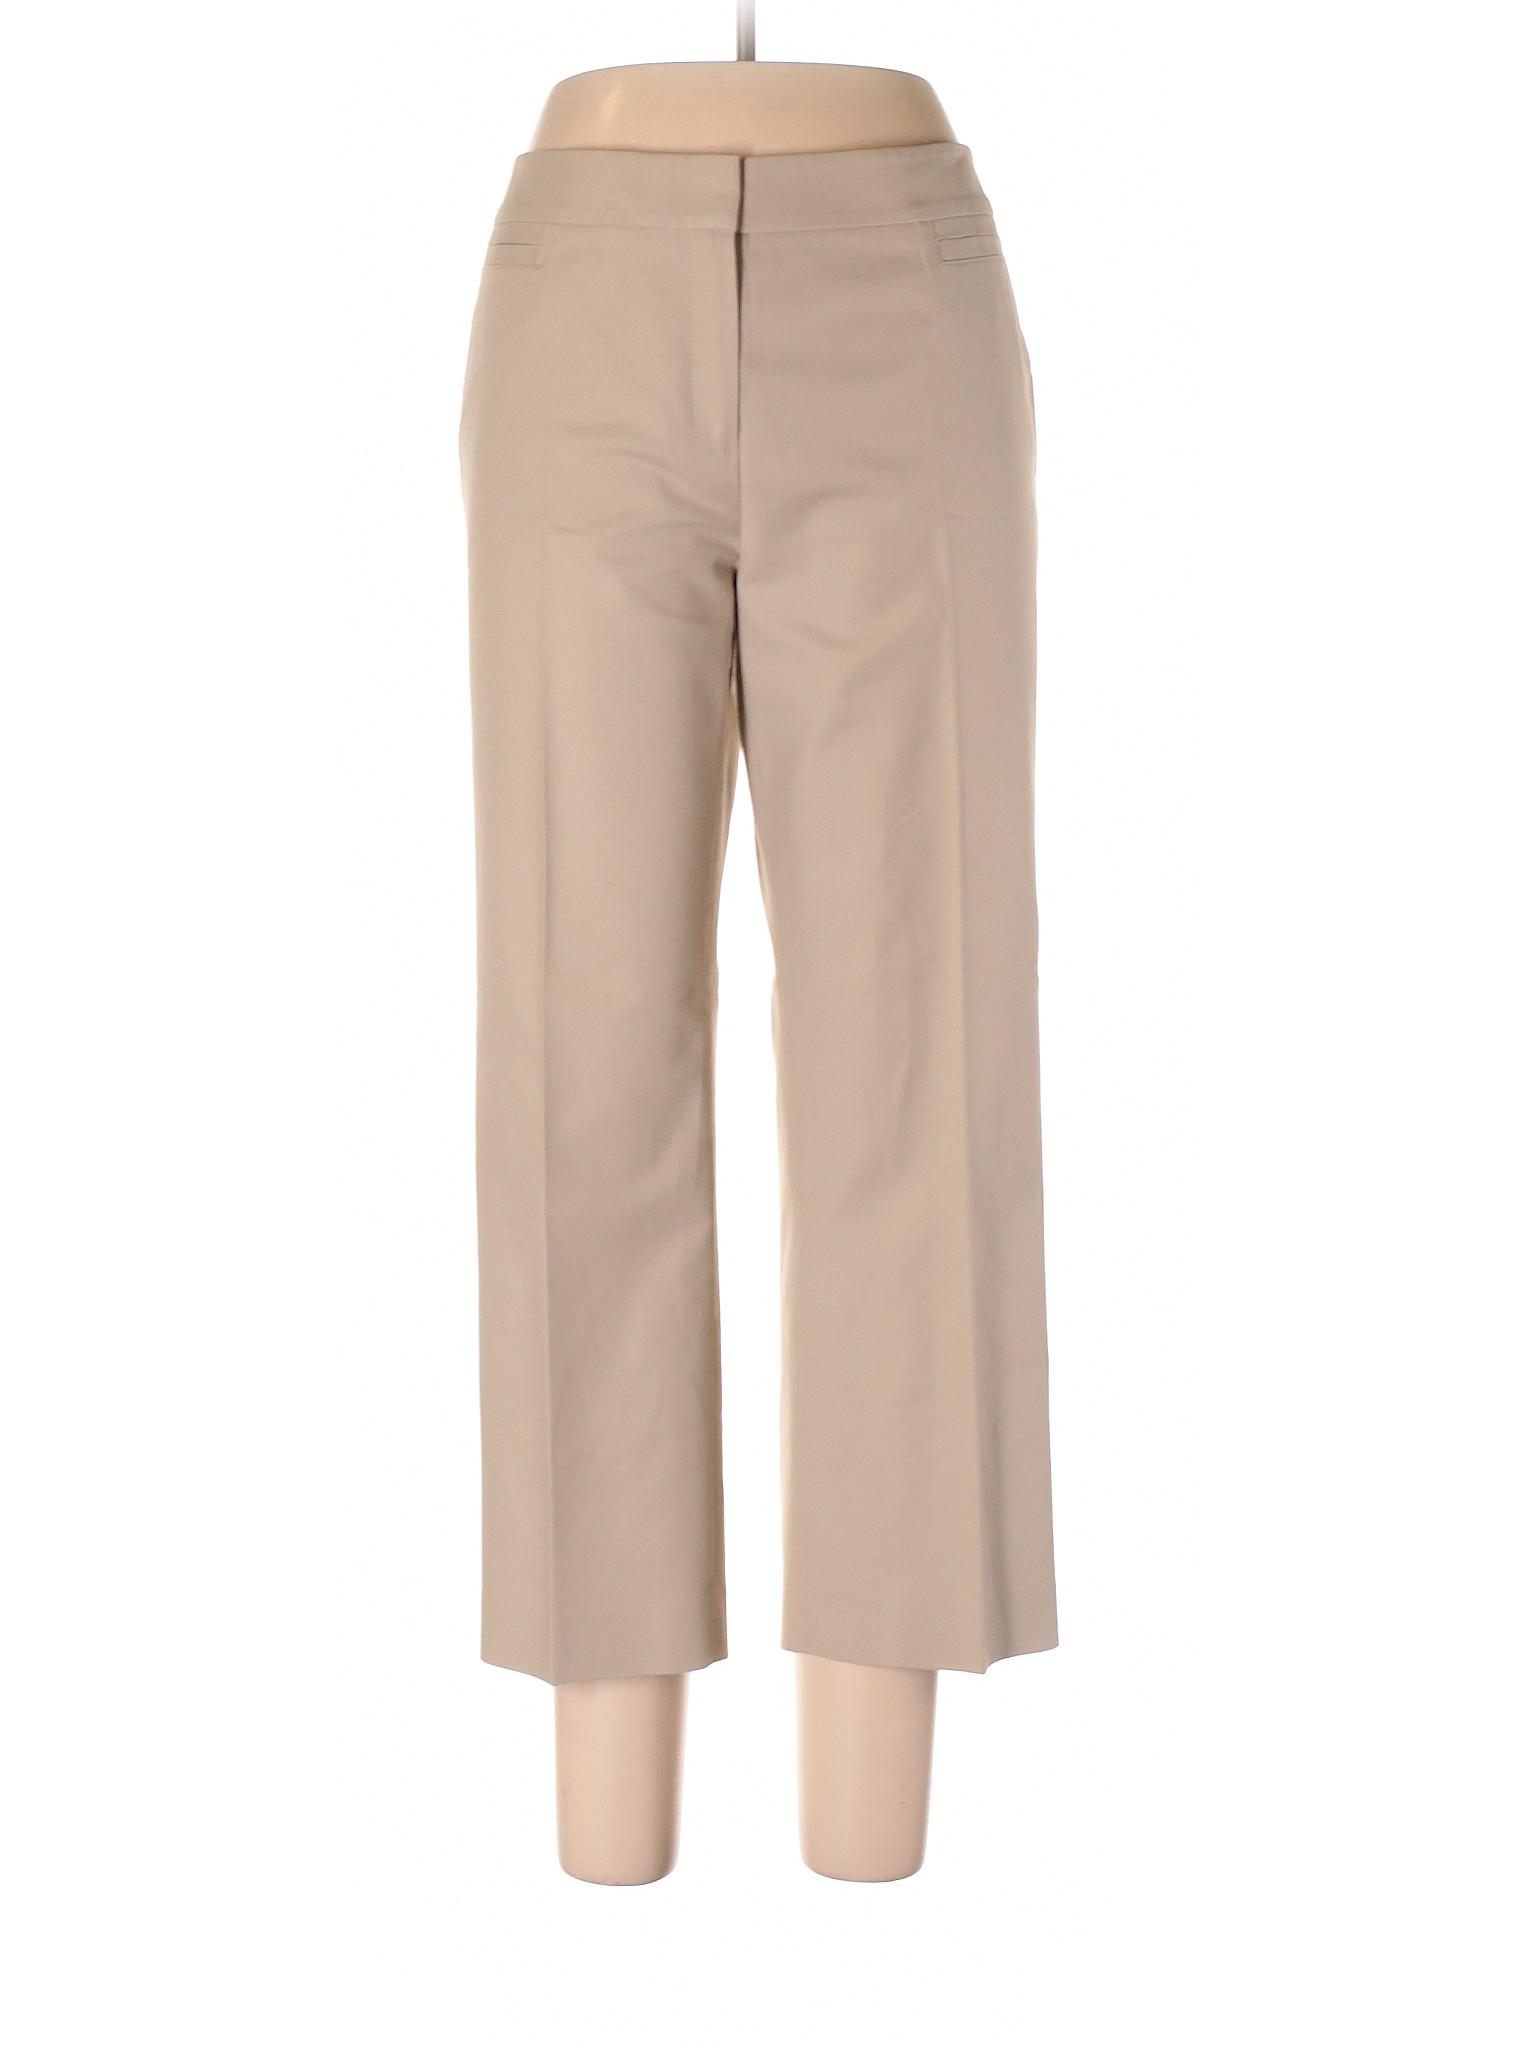 Dress York New 148 Boutique leisure Lafayette Pants wxFAZOqg